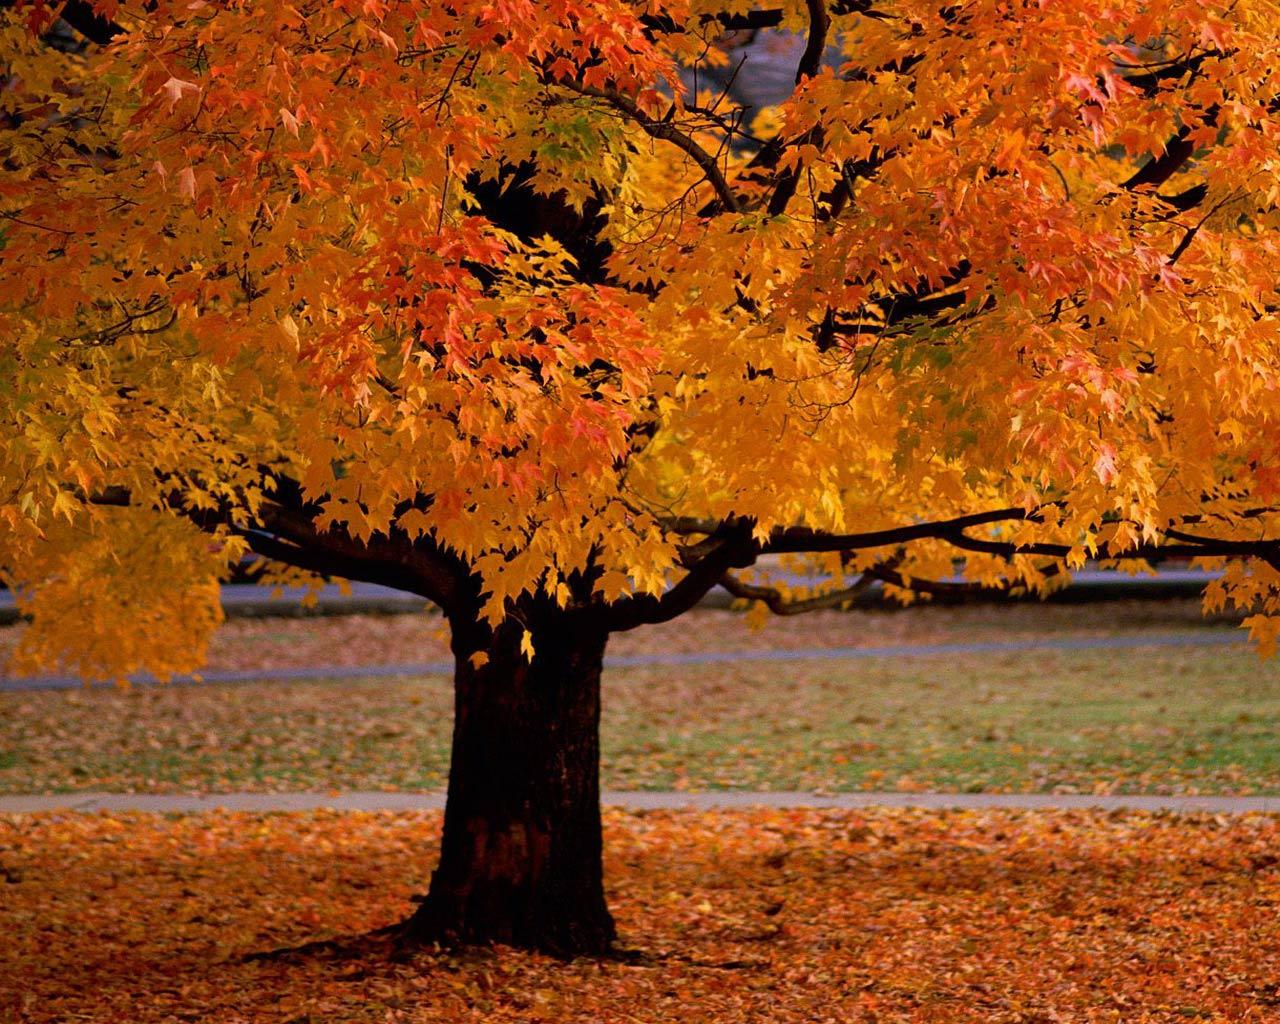 Autumn Trees Desktop Wallpaper Top Quality Wallpapers 1280x1024